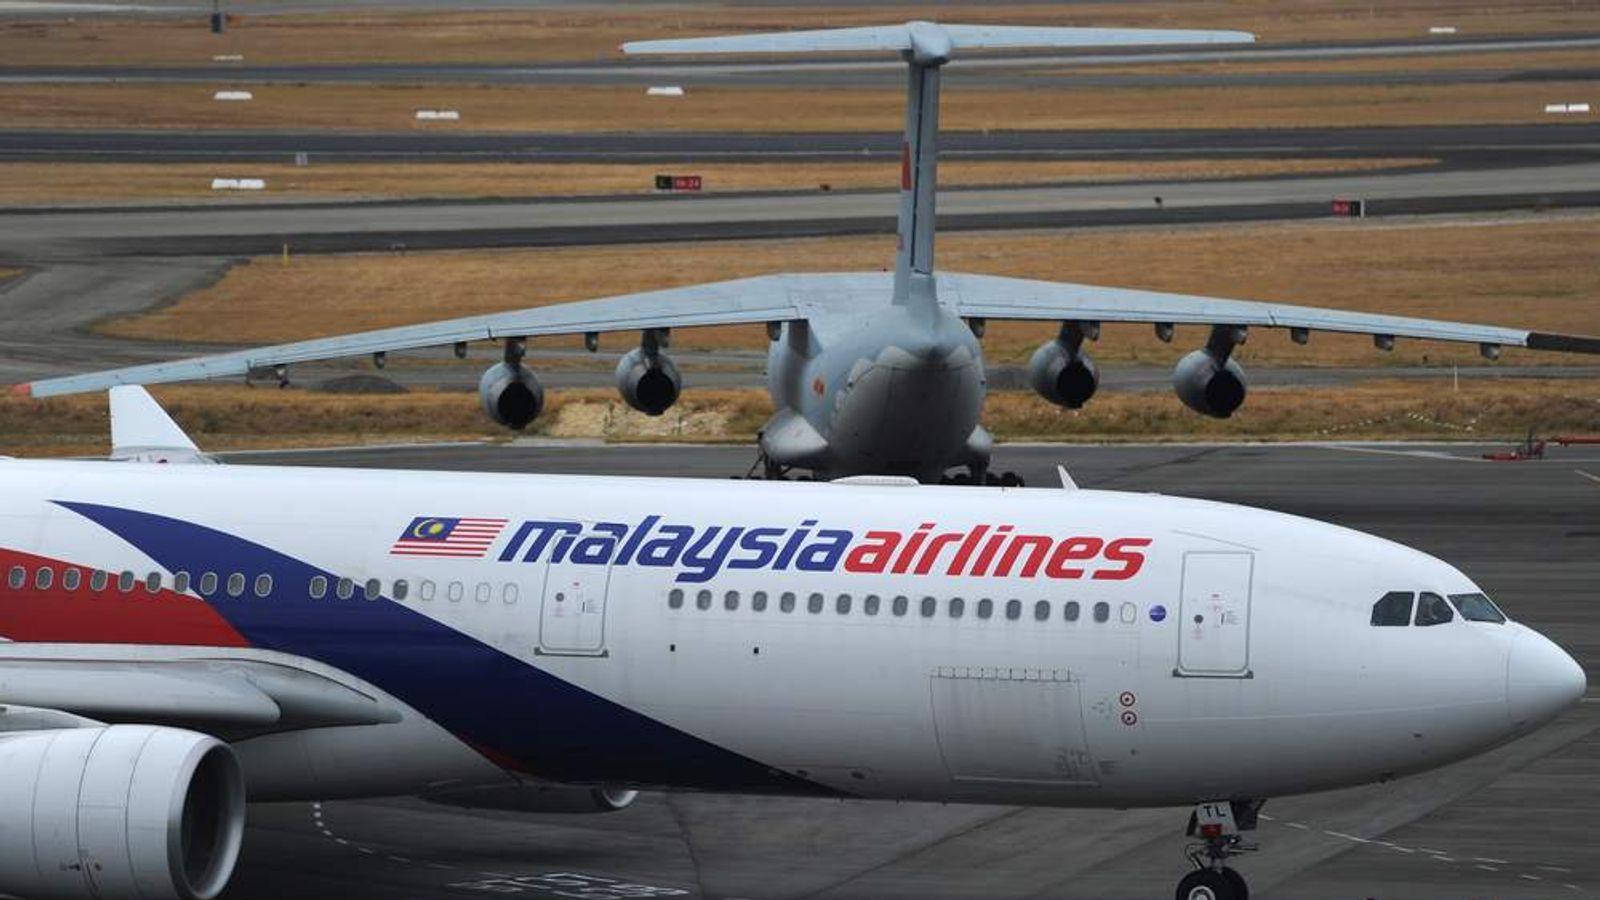 AUSTRALIA-MALAYSIA-CHINA-MALAYSIAAIRLINES-TRANSPORT